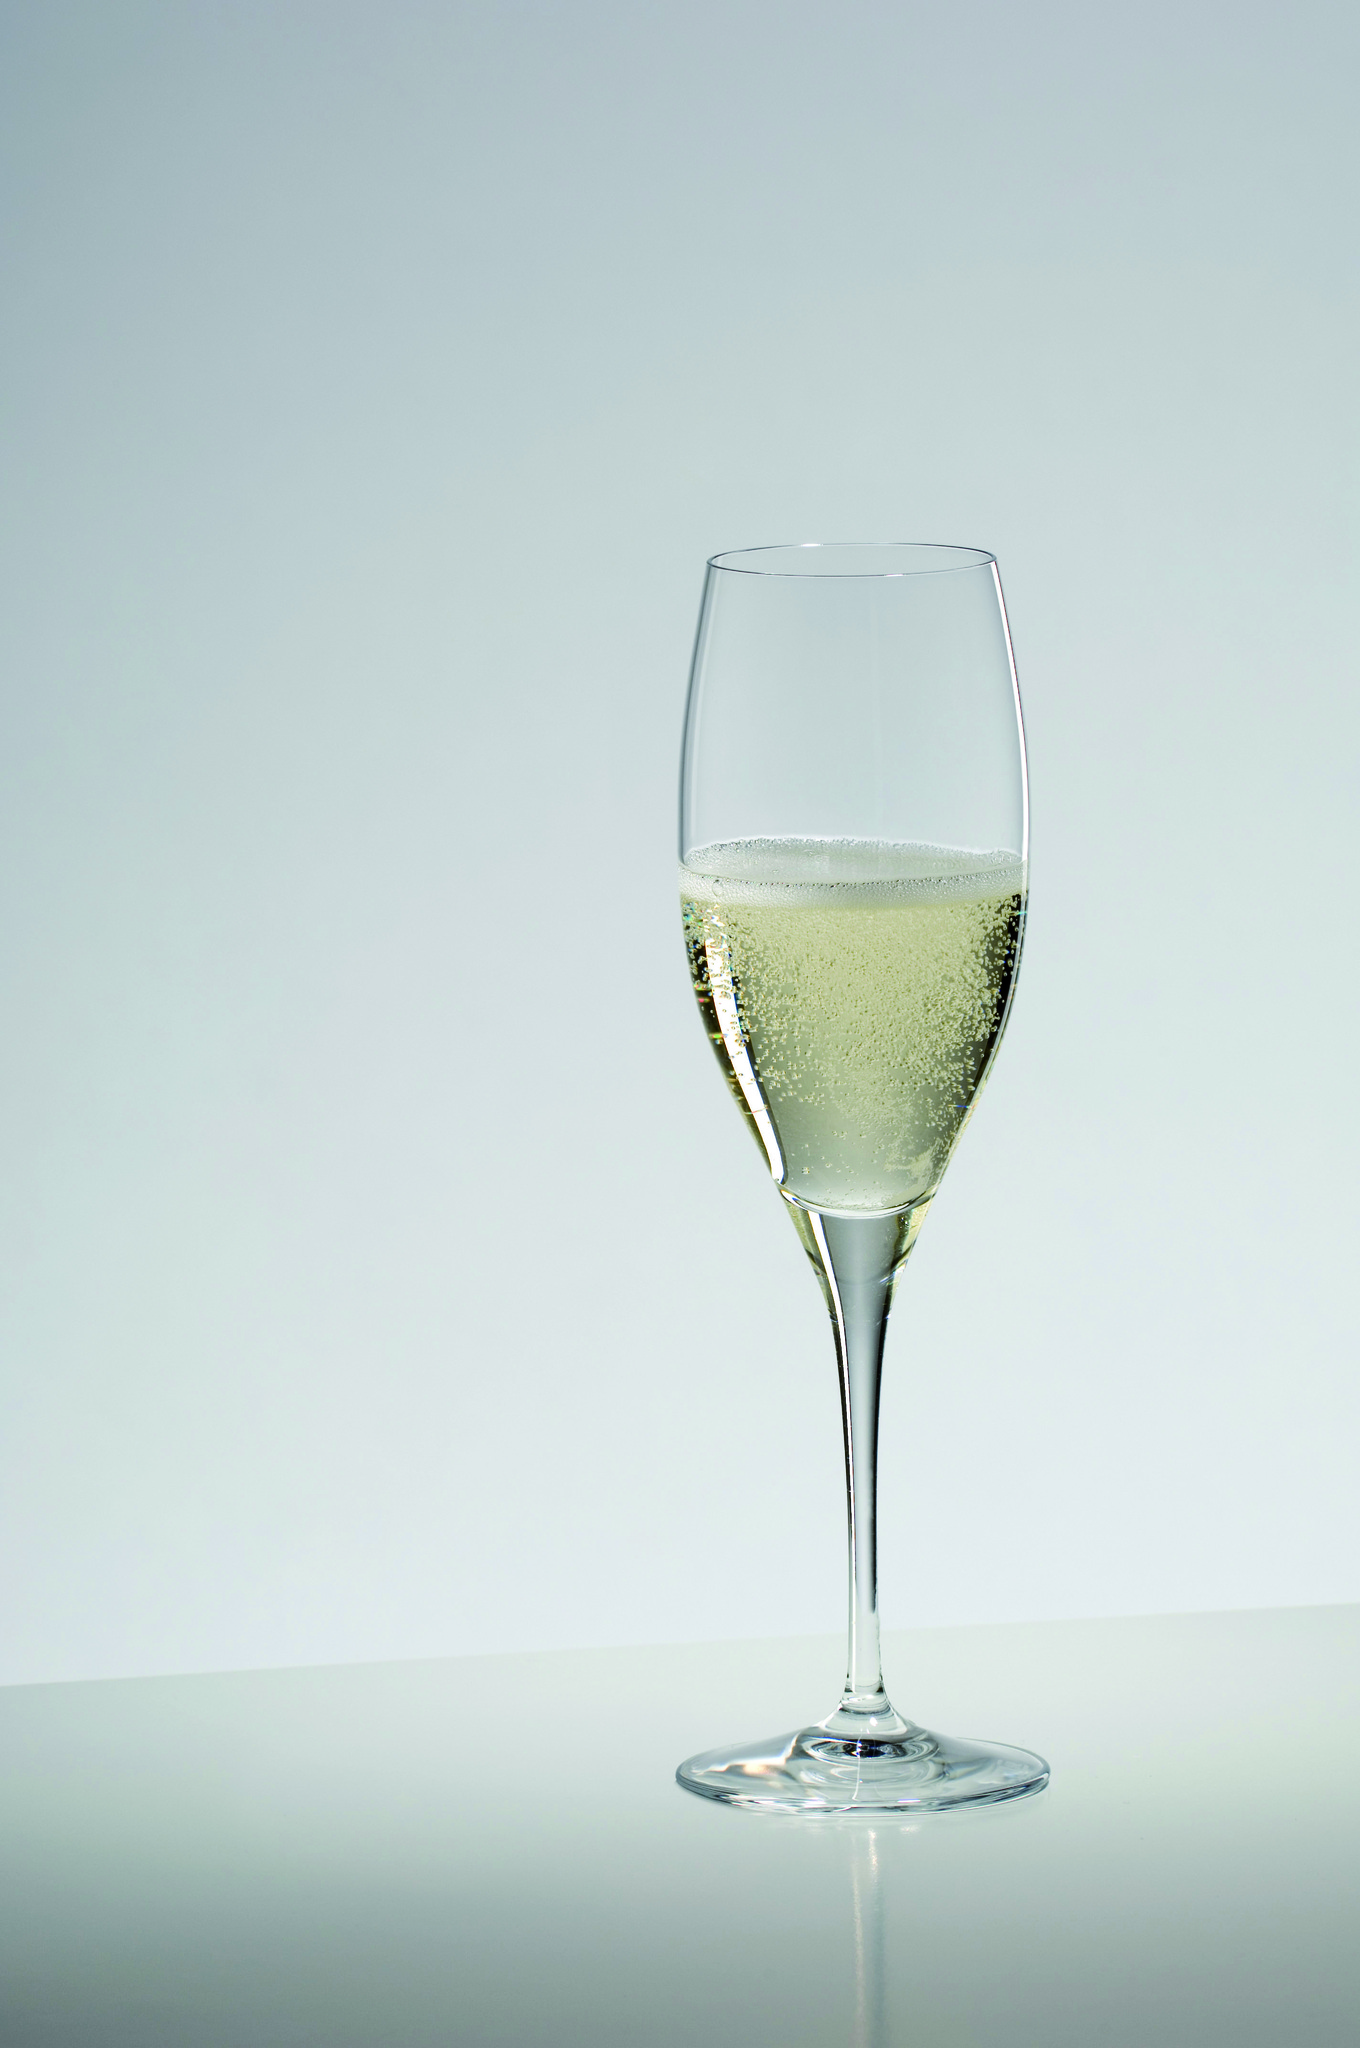 Бокалы Набор бокалов для шампанского 2шт 230мл Riedel Vinum Cuvee Prestige nabor-bokalov-dlya-shampanskogo-2-sht-230-ml-riedel-vinum-cuvee-prestige-avstriya.jpg